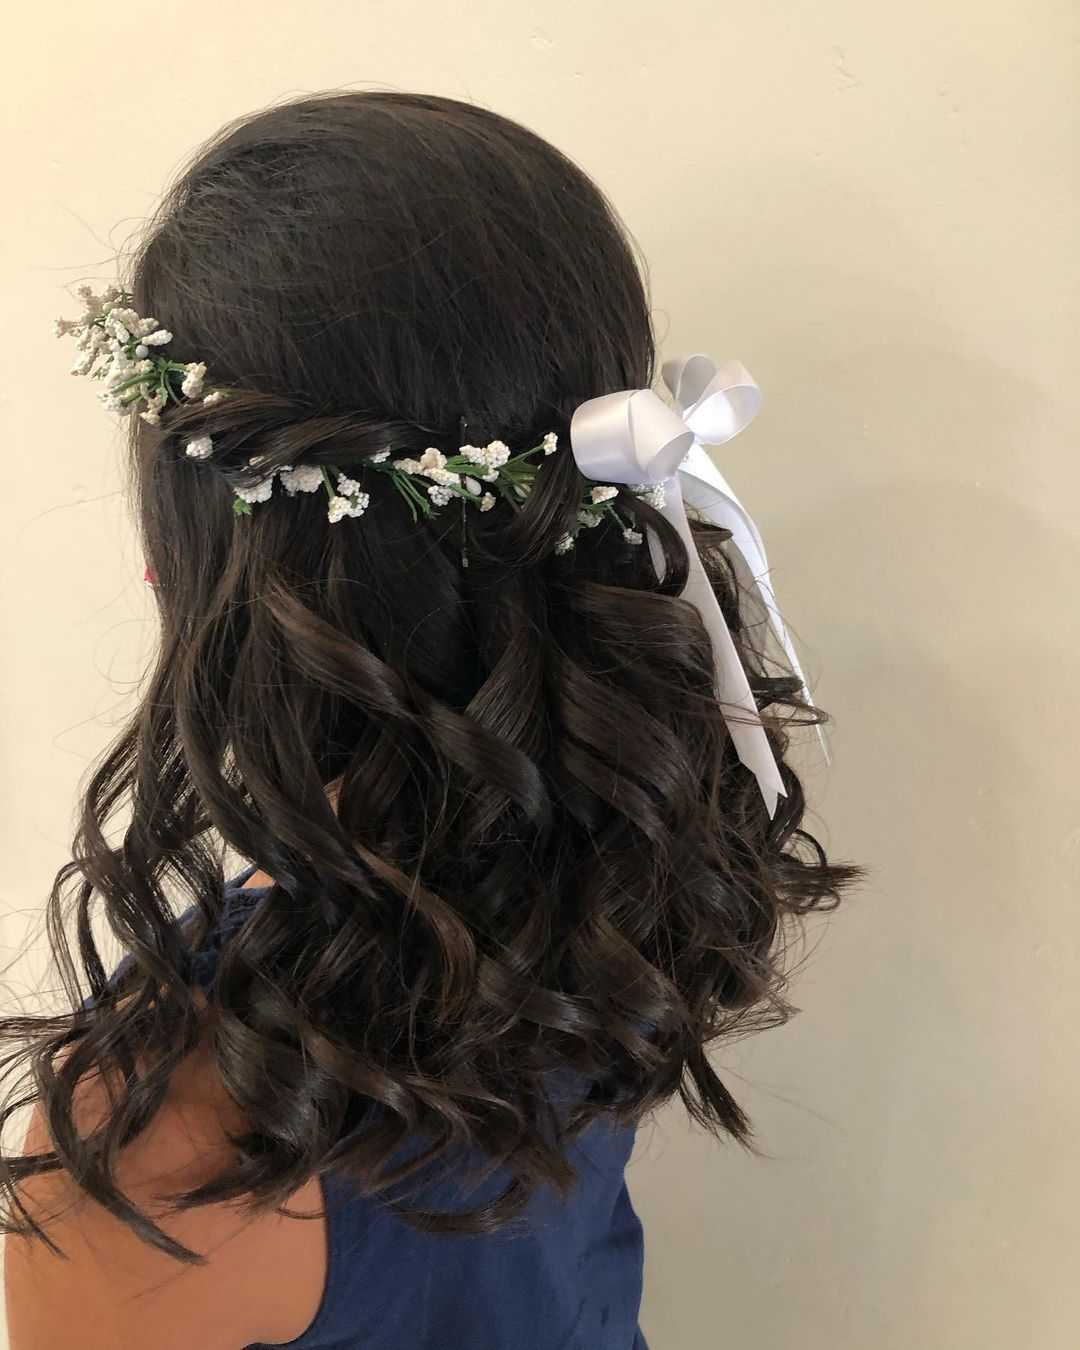 fryzura na komunie dla chrzestnej